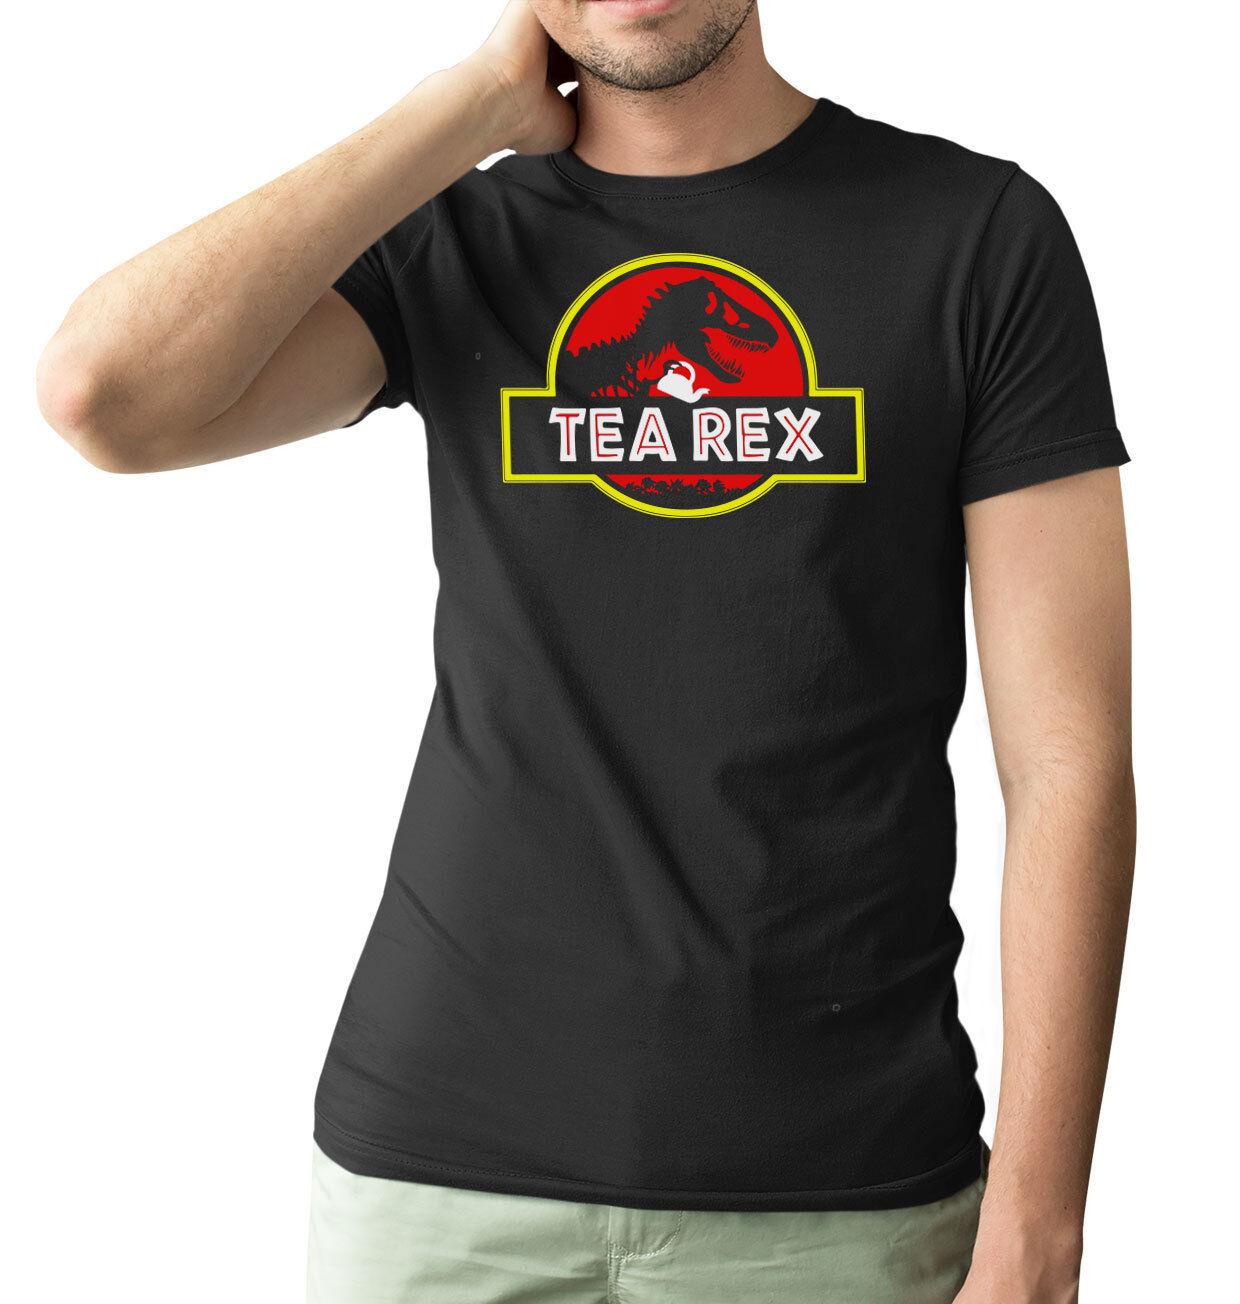 New Mens Jurassic Park Classic Logo Short Sleeve Black T-Shirt XL Sizes Tee M